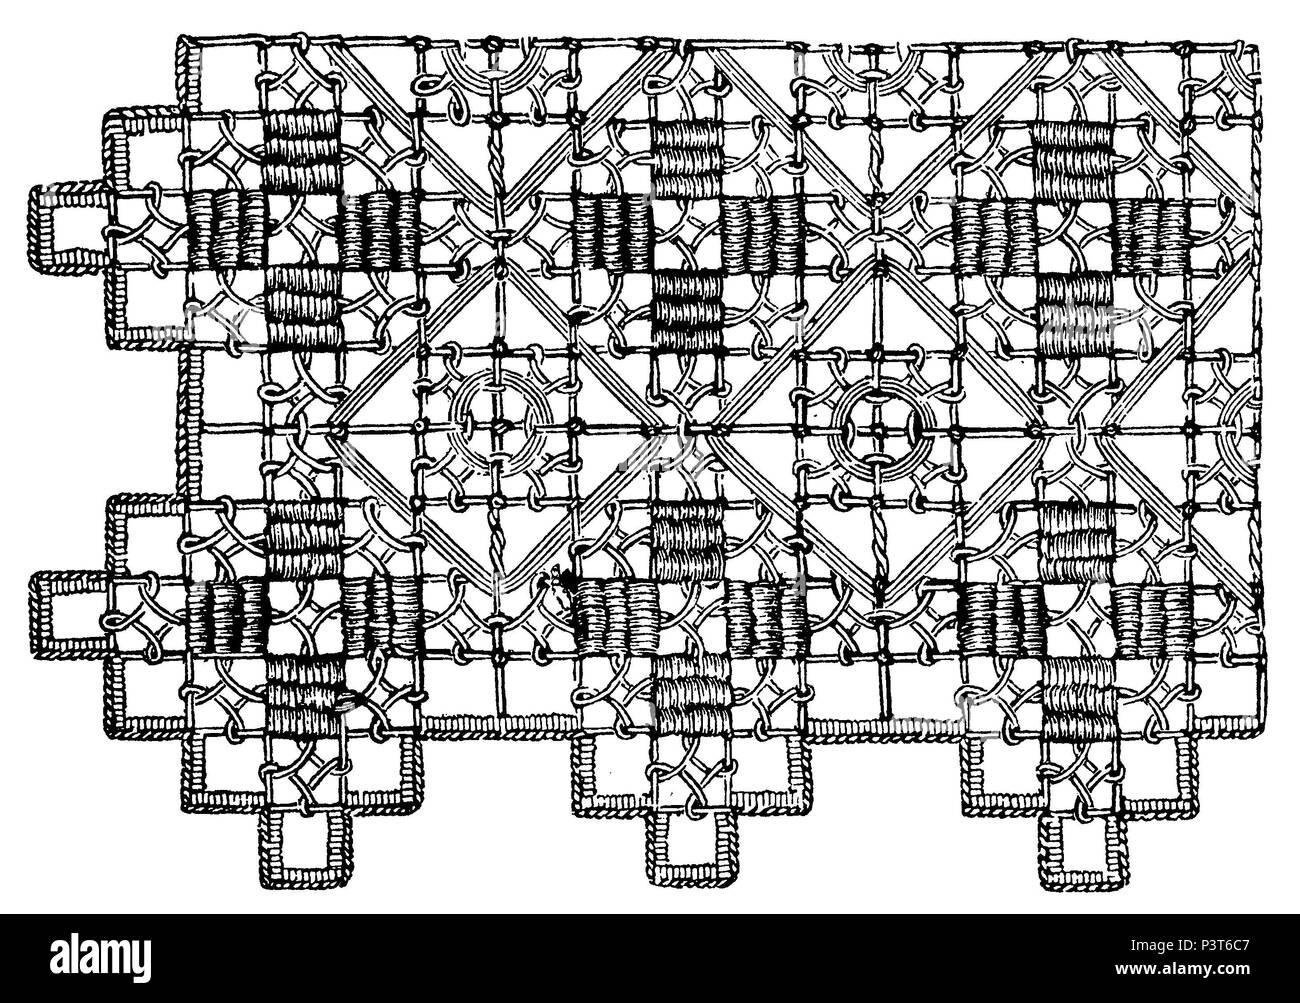 Pattern of darning stitch and festoon stitch, anonym  1879 - Stock Image